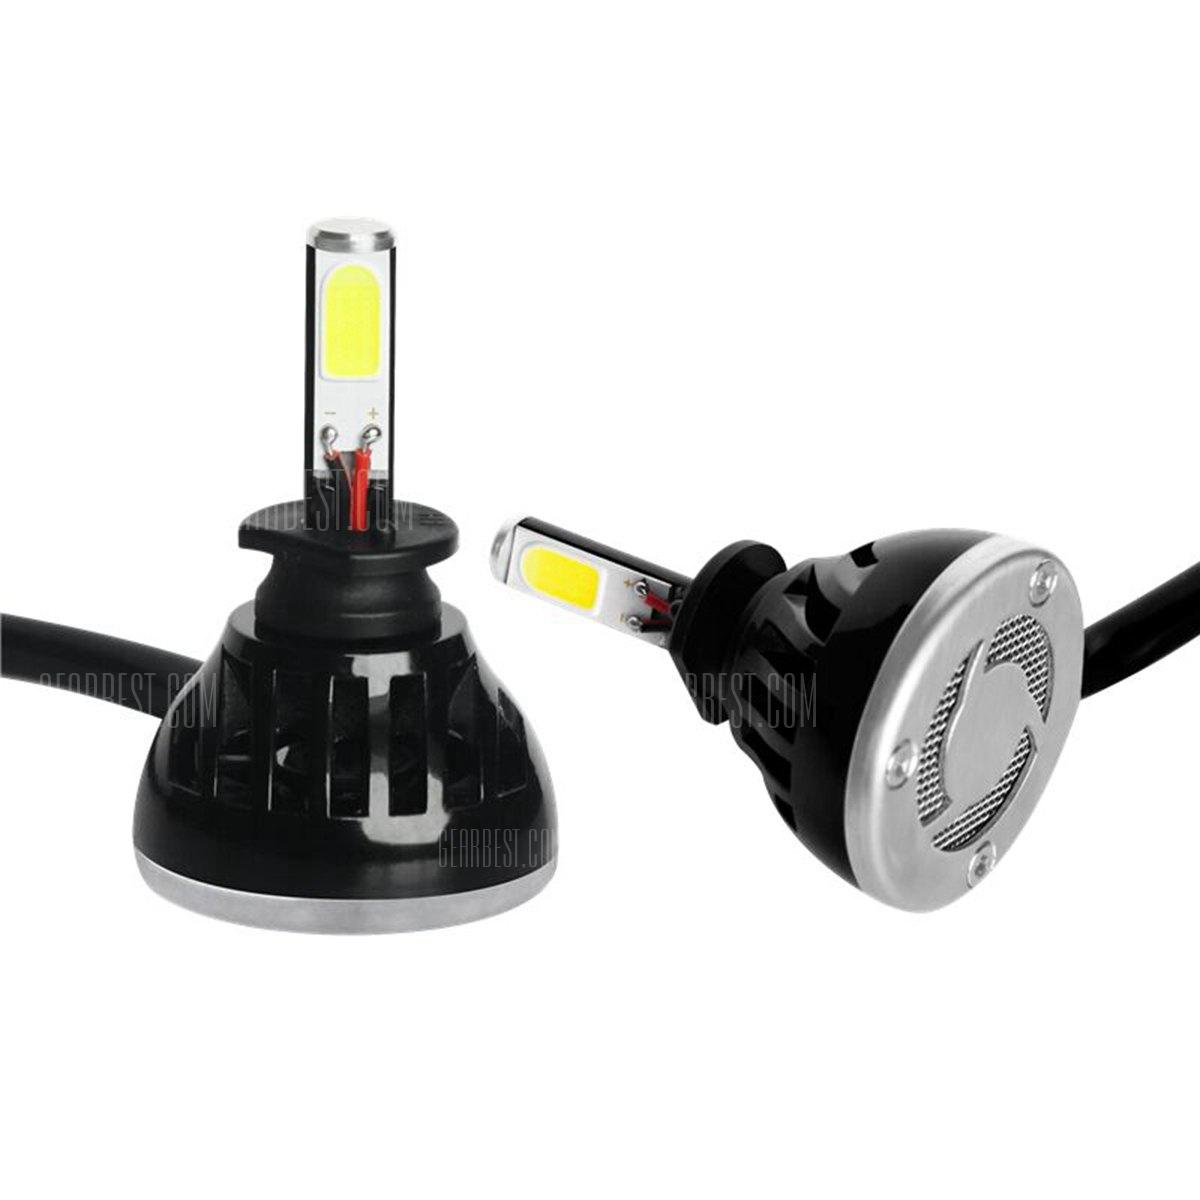 2PCS G5 5HL - H1 Car lamp Hi/Lo